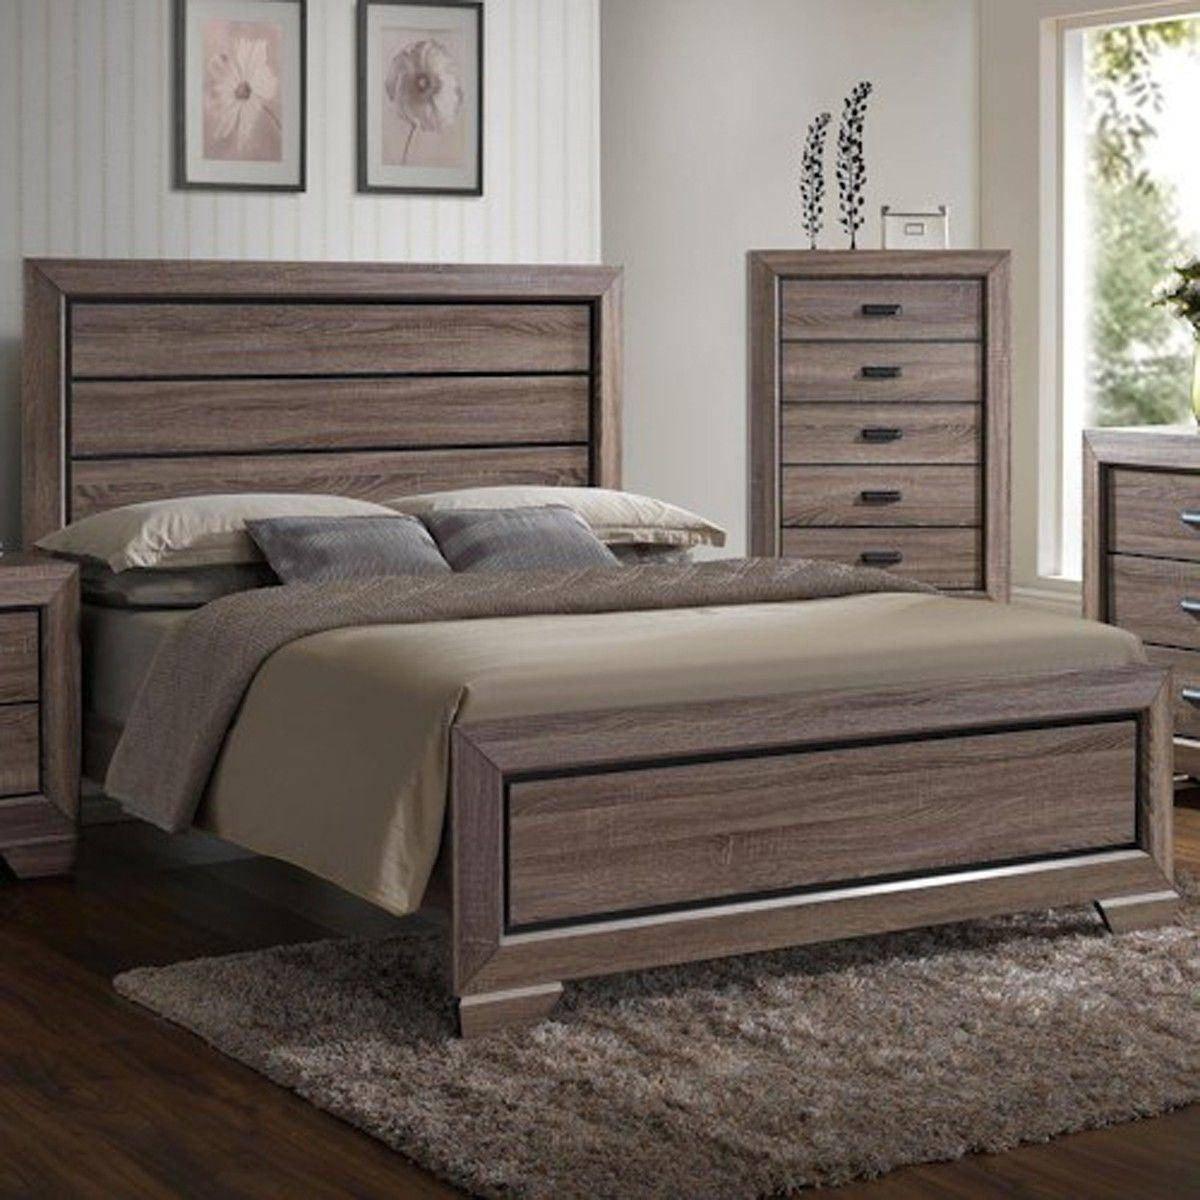 Solid Wood Bedroom Set Best Of Crown Mark B5500 Farrow Grey Brown Finish solid Wood Queen